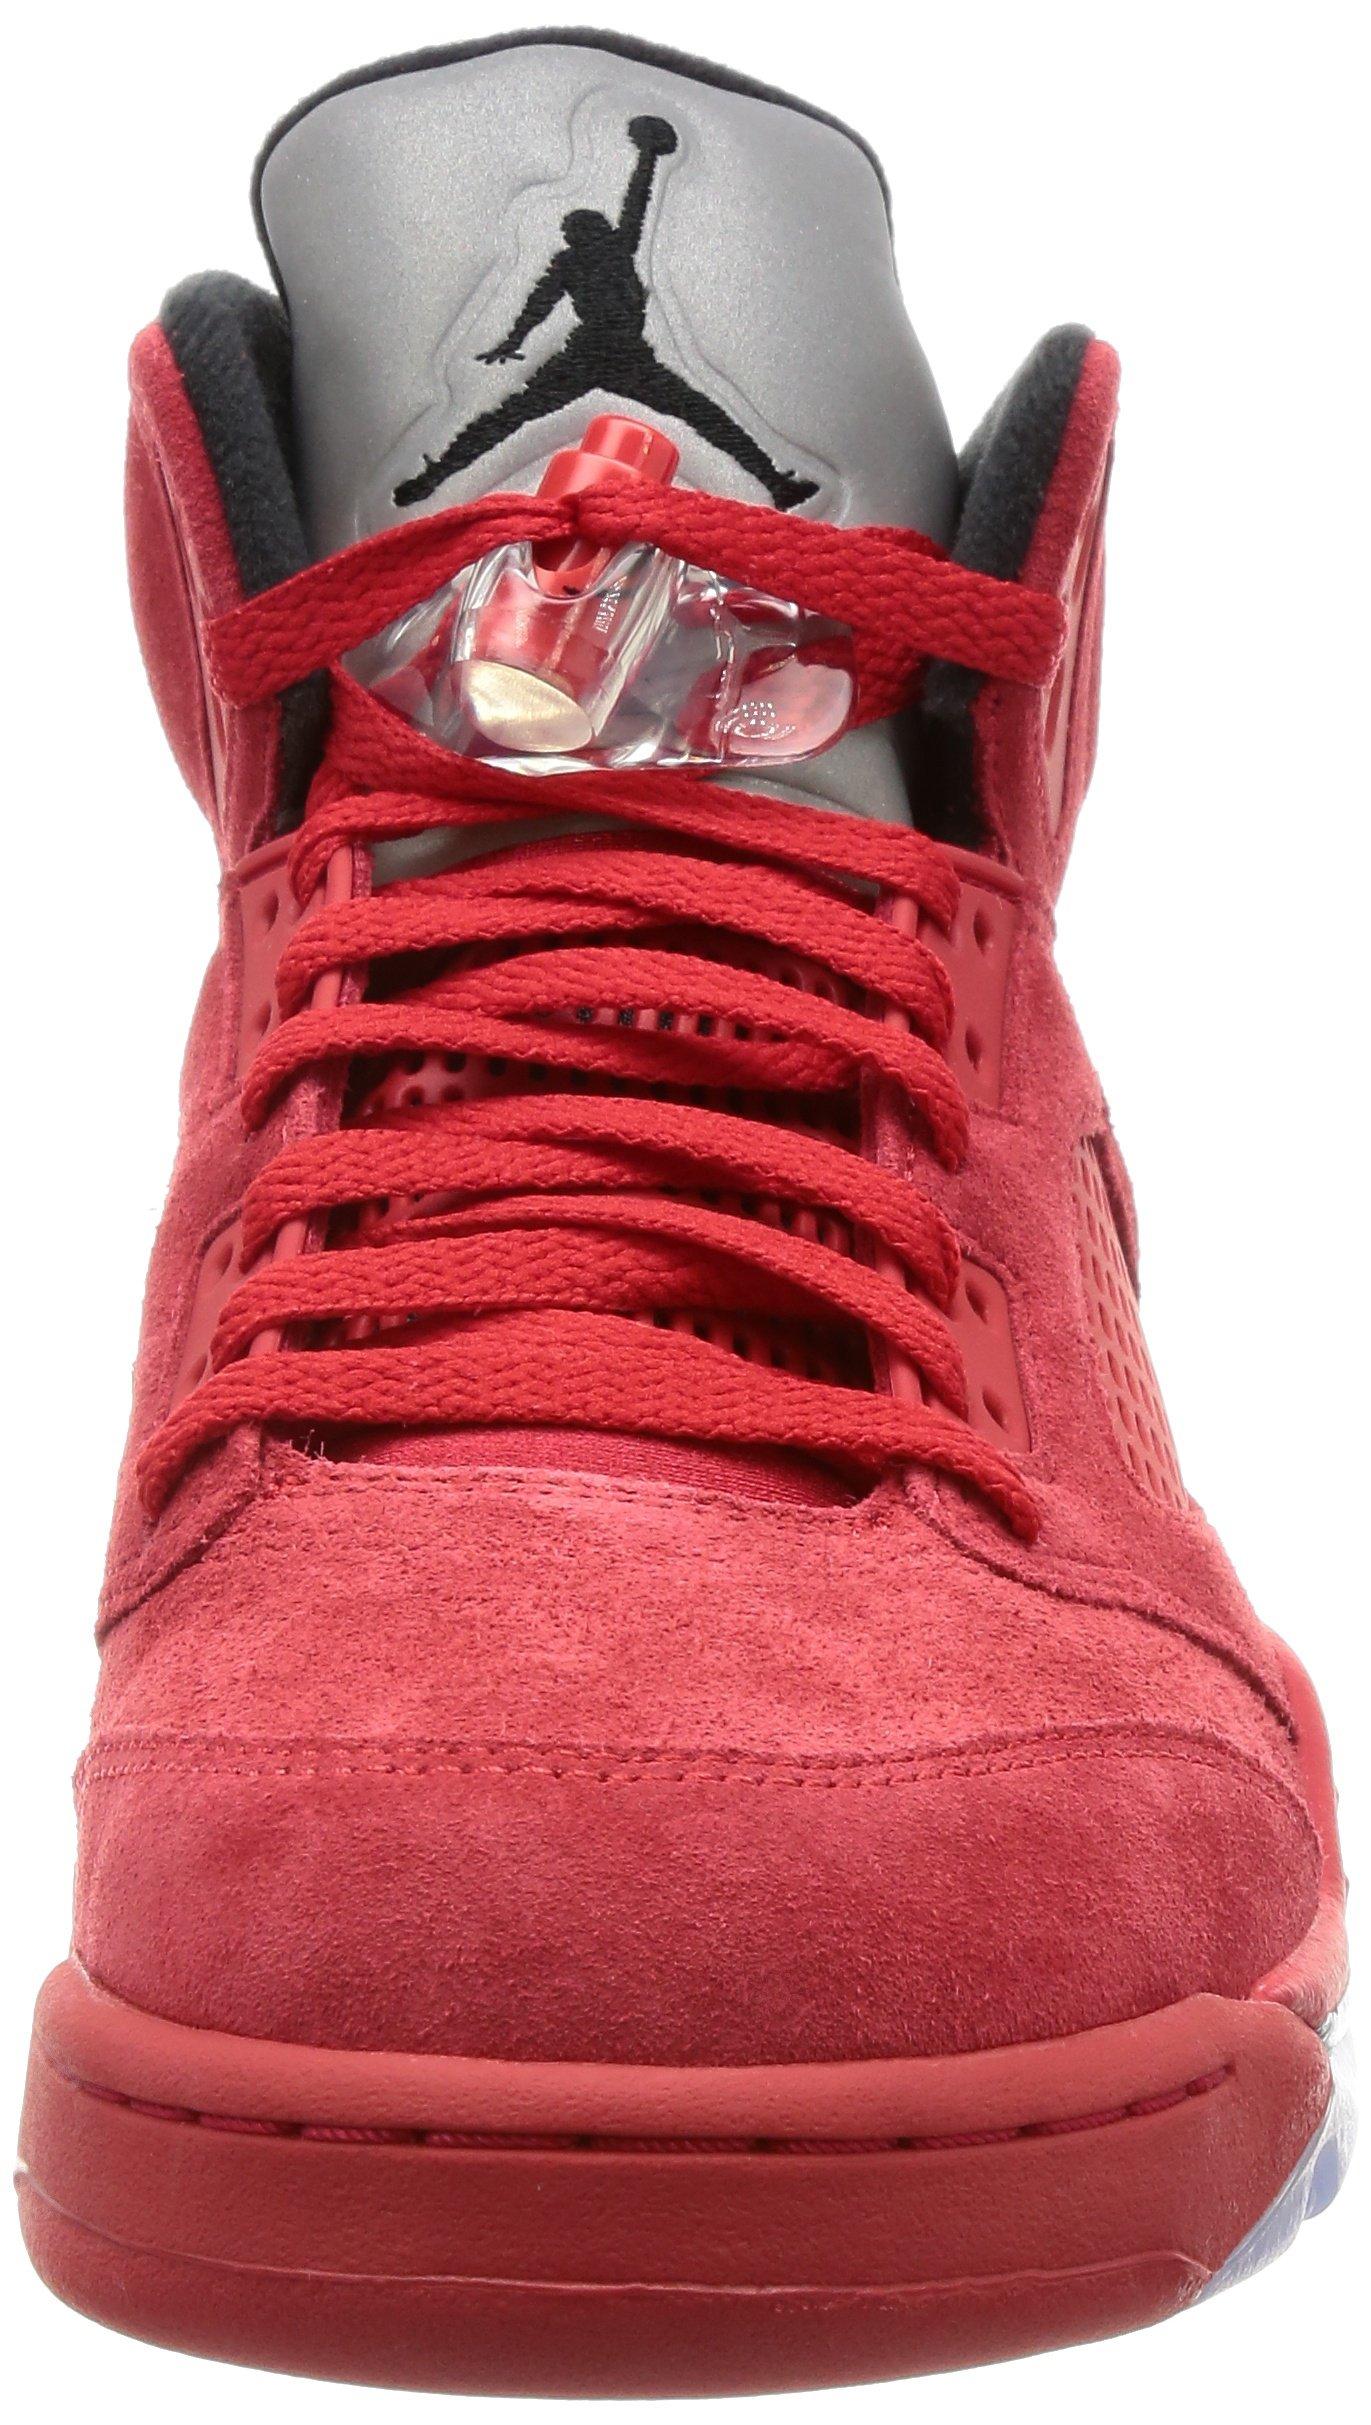 81CBR4iGnoL - Nike Air Jordan 5 Retro 'Red Suede' - 136027-602 - Size 9 -